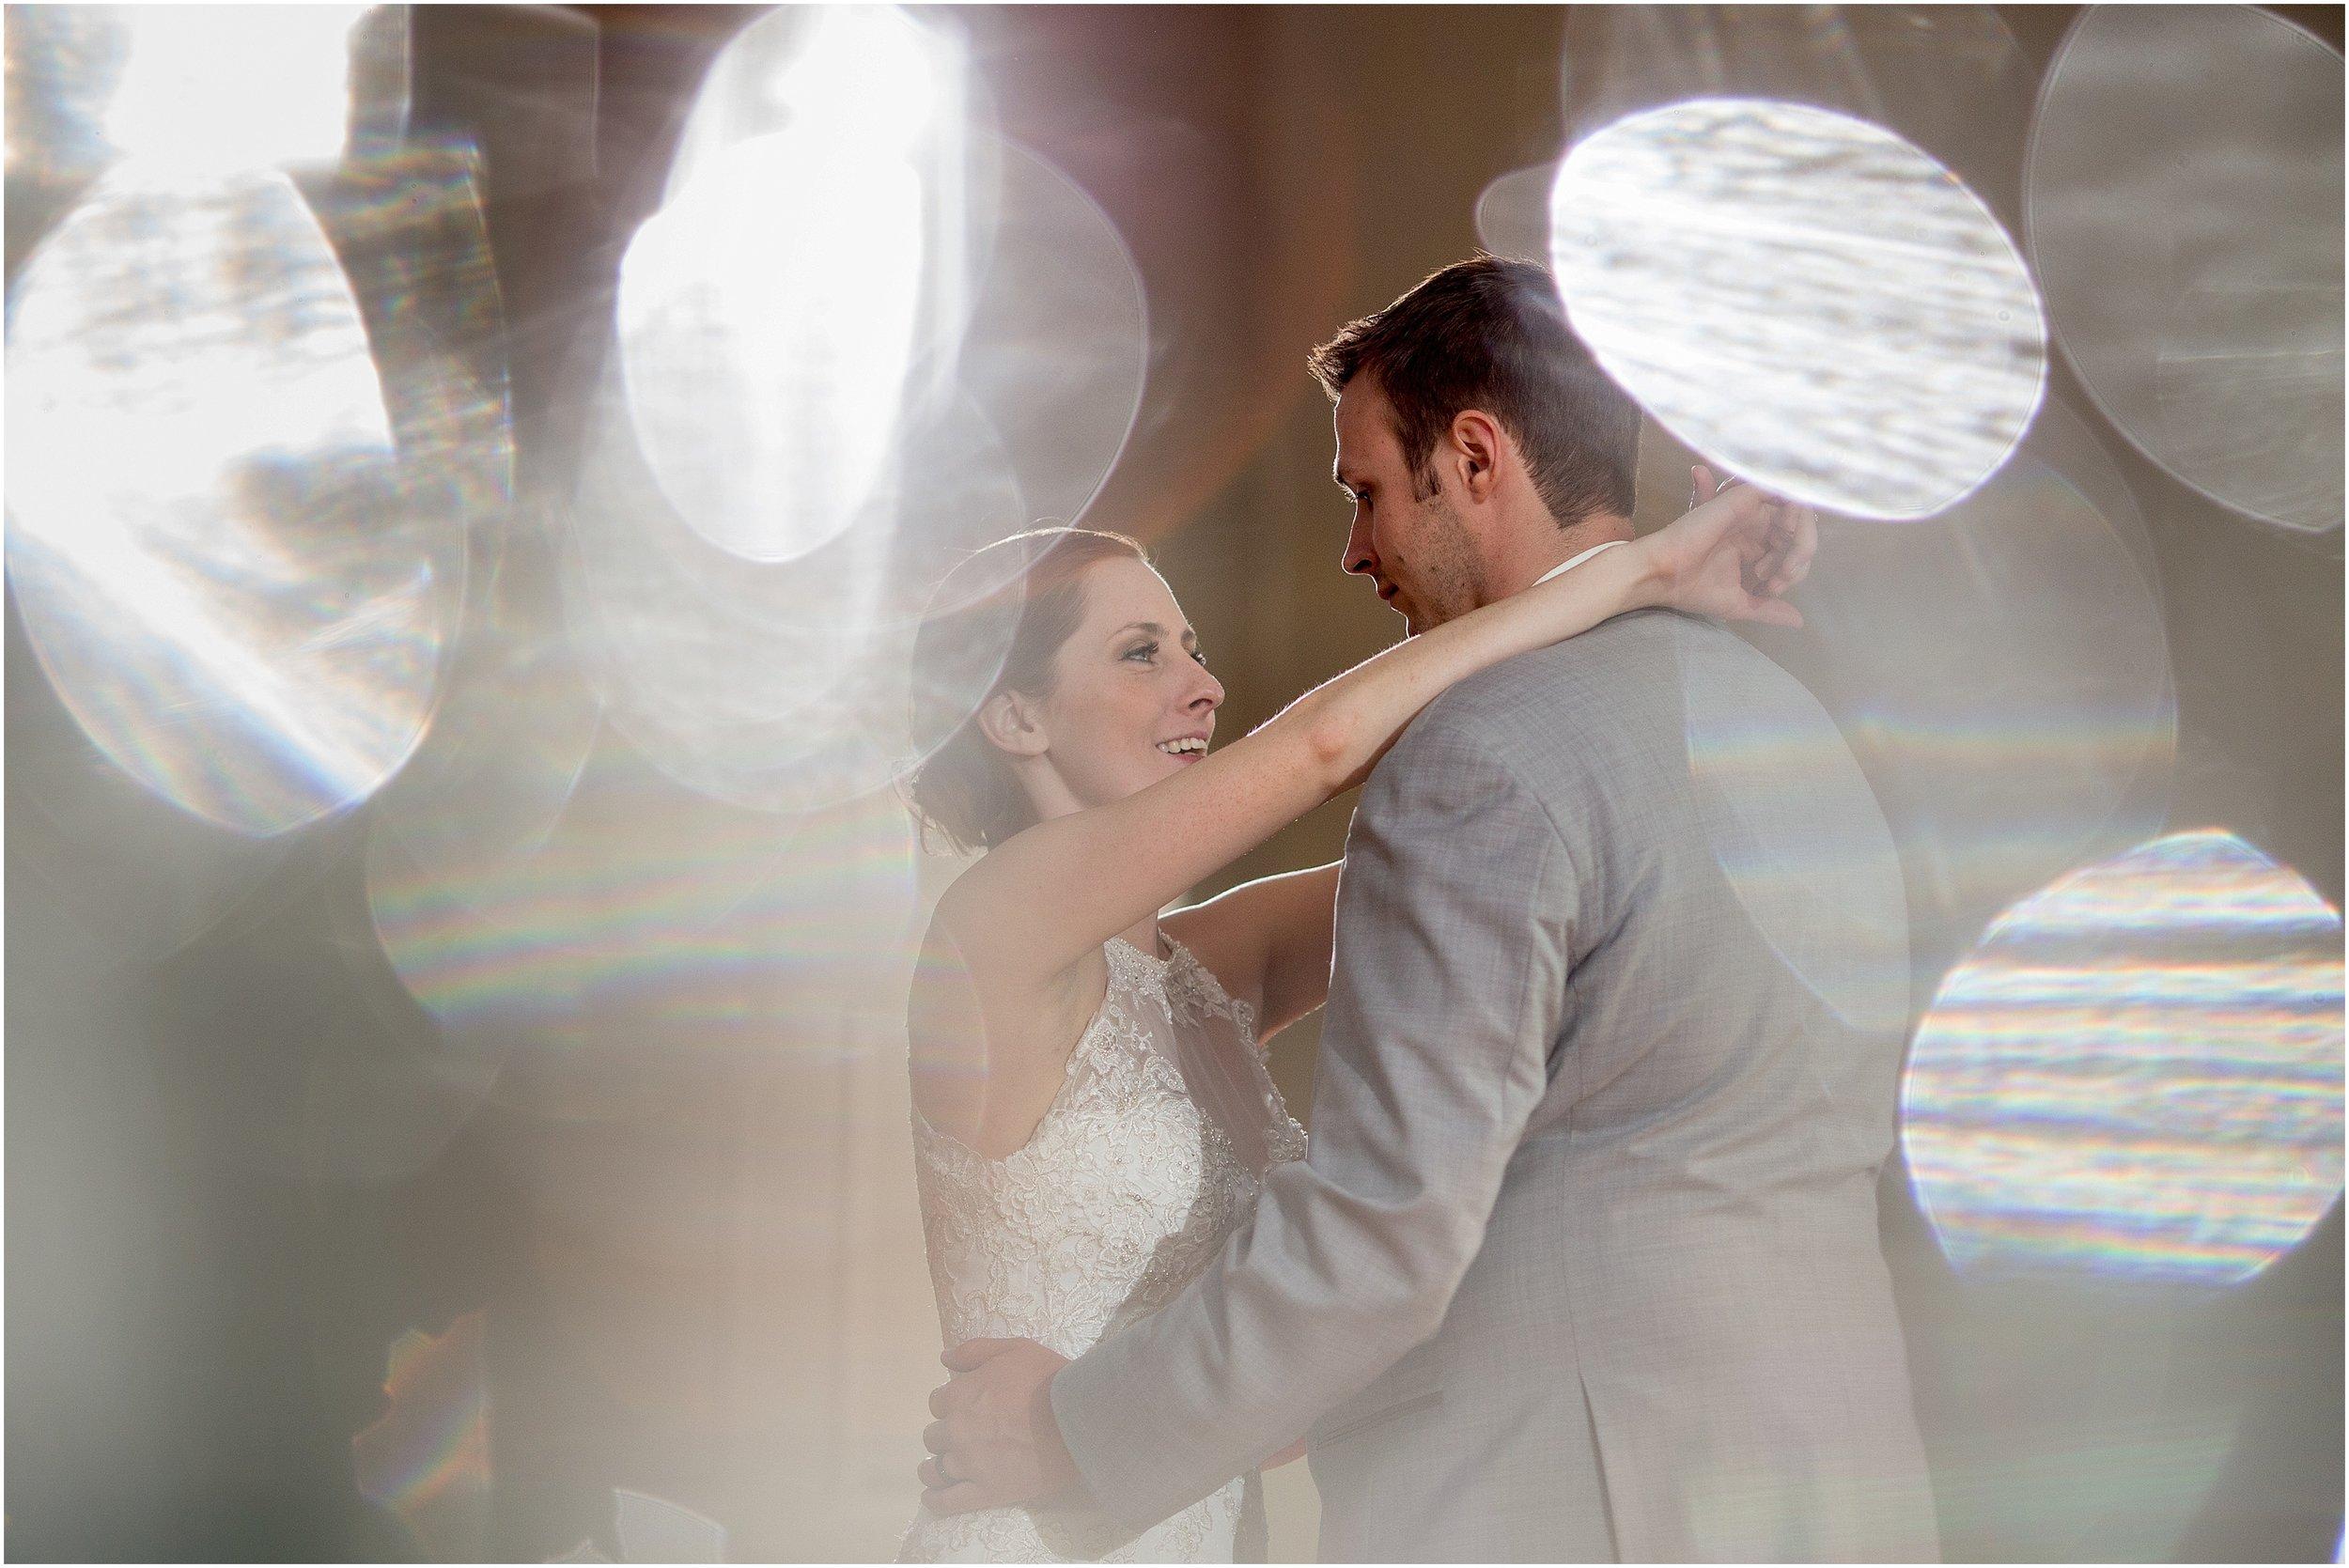 Williamsport_Wedding_0053.jpg